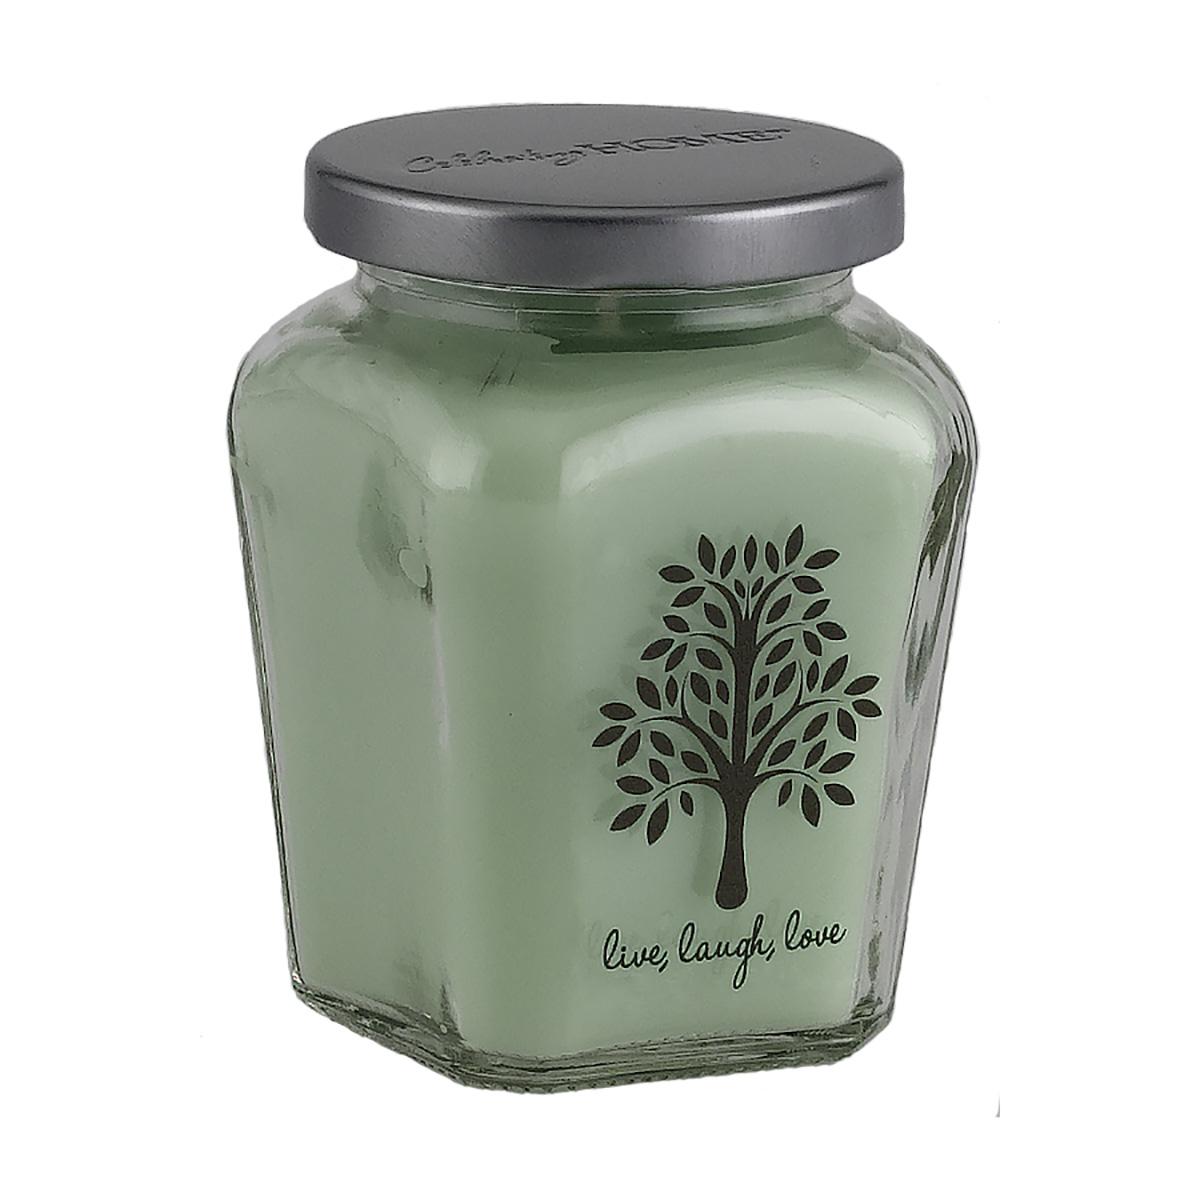 Petite Jar Candle - Pear Vanilla